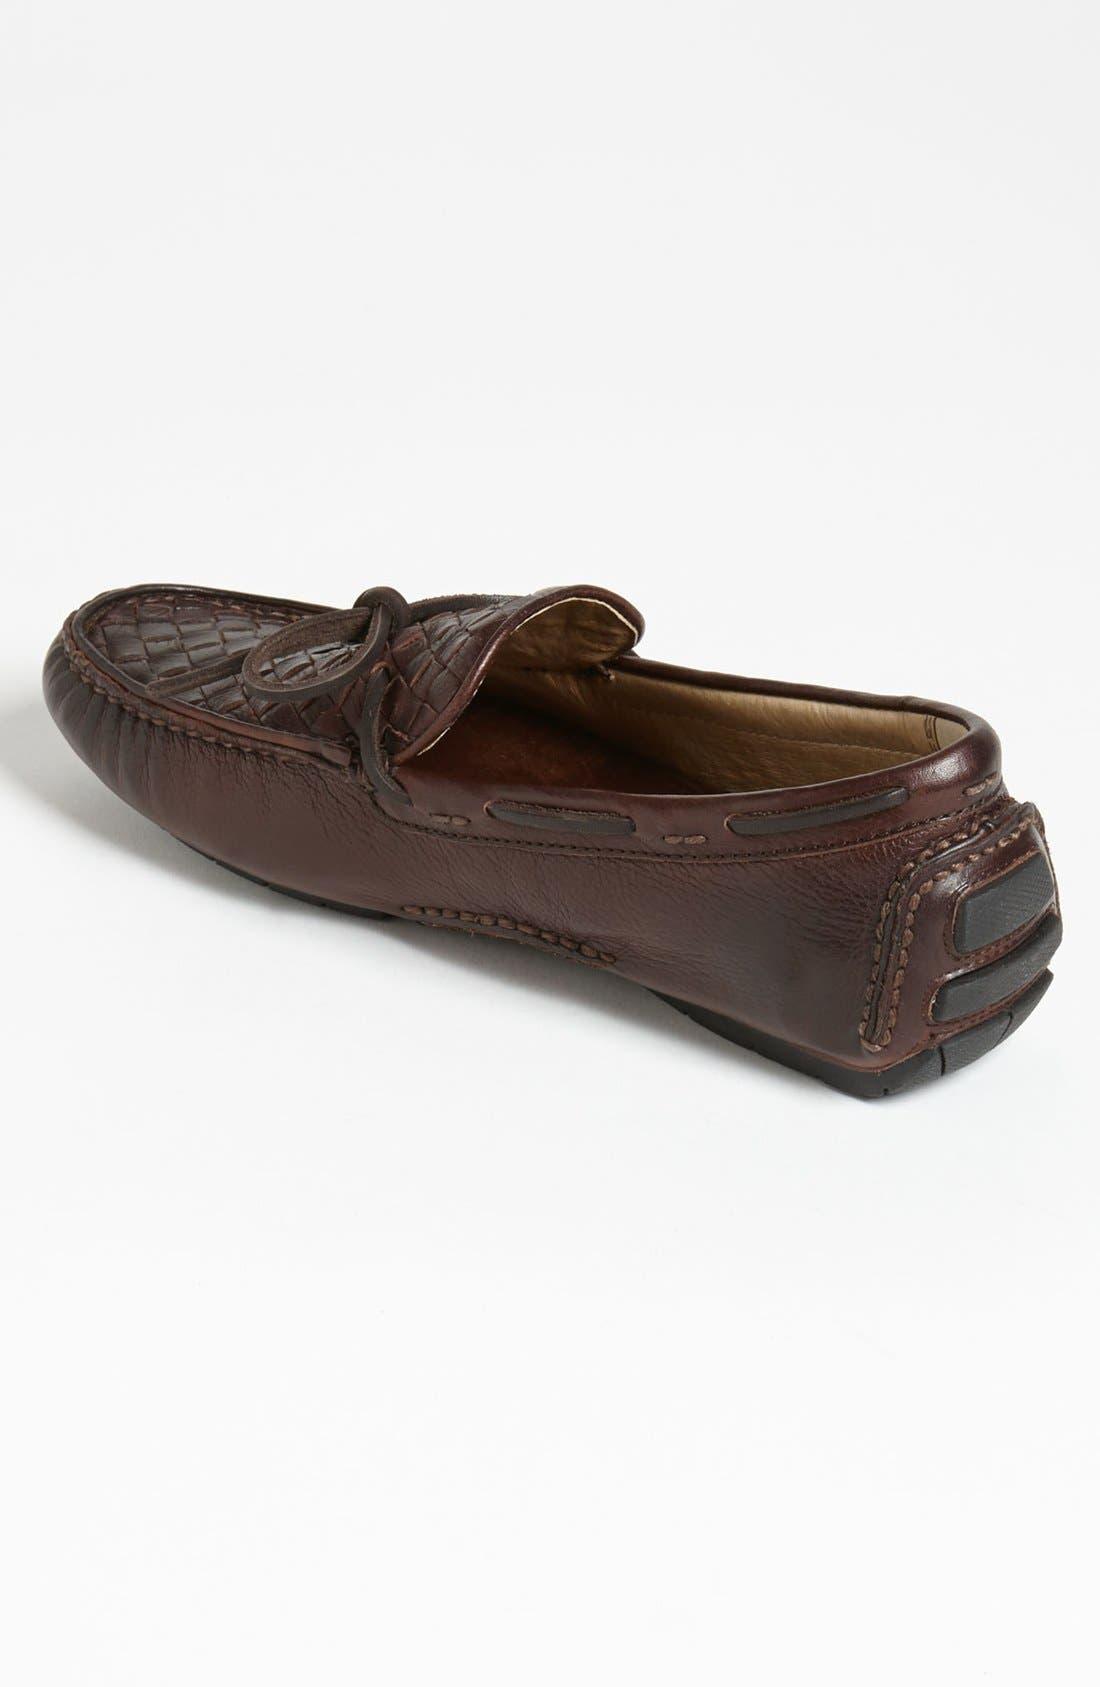 Alternate Image 2  - Frye 'West' Driving Shoe